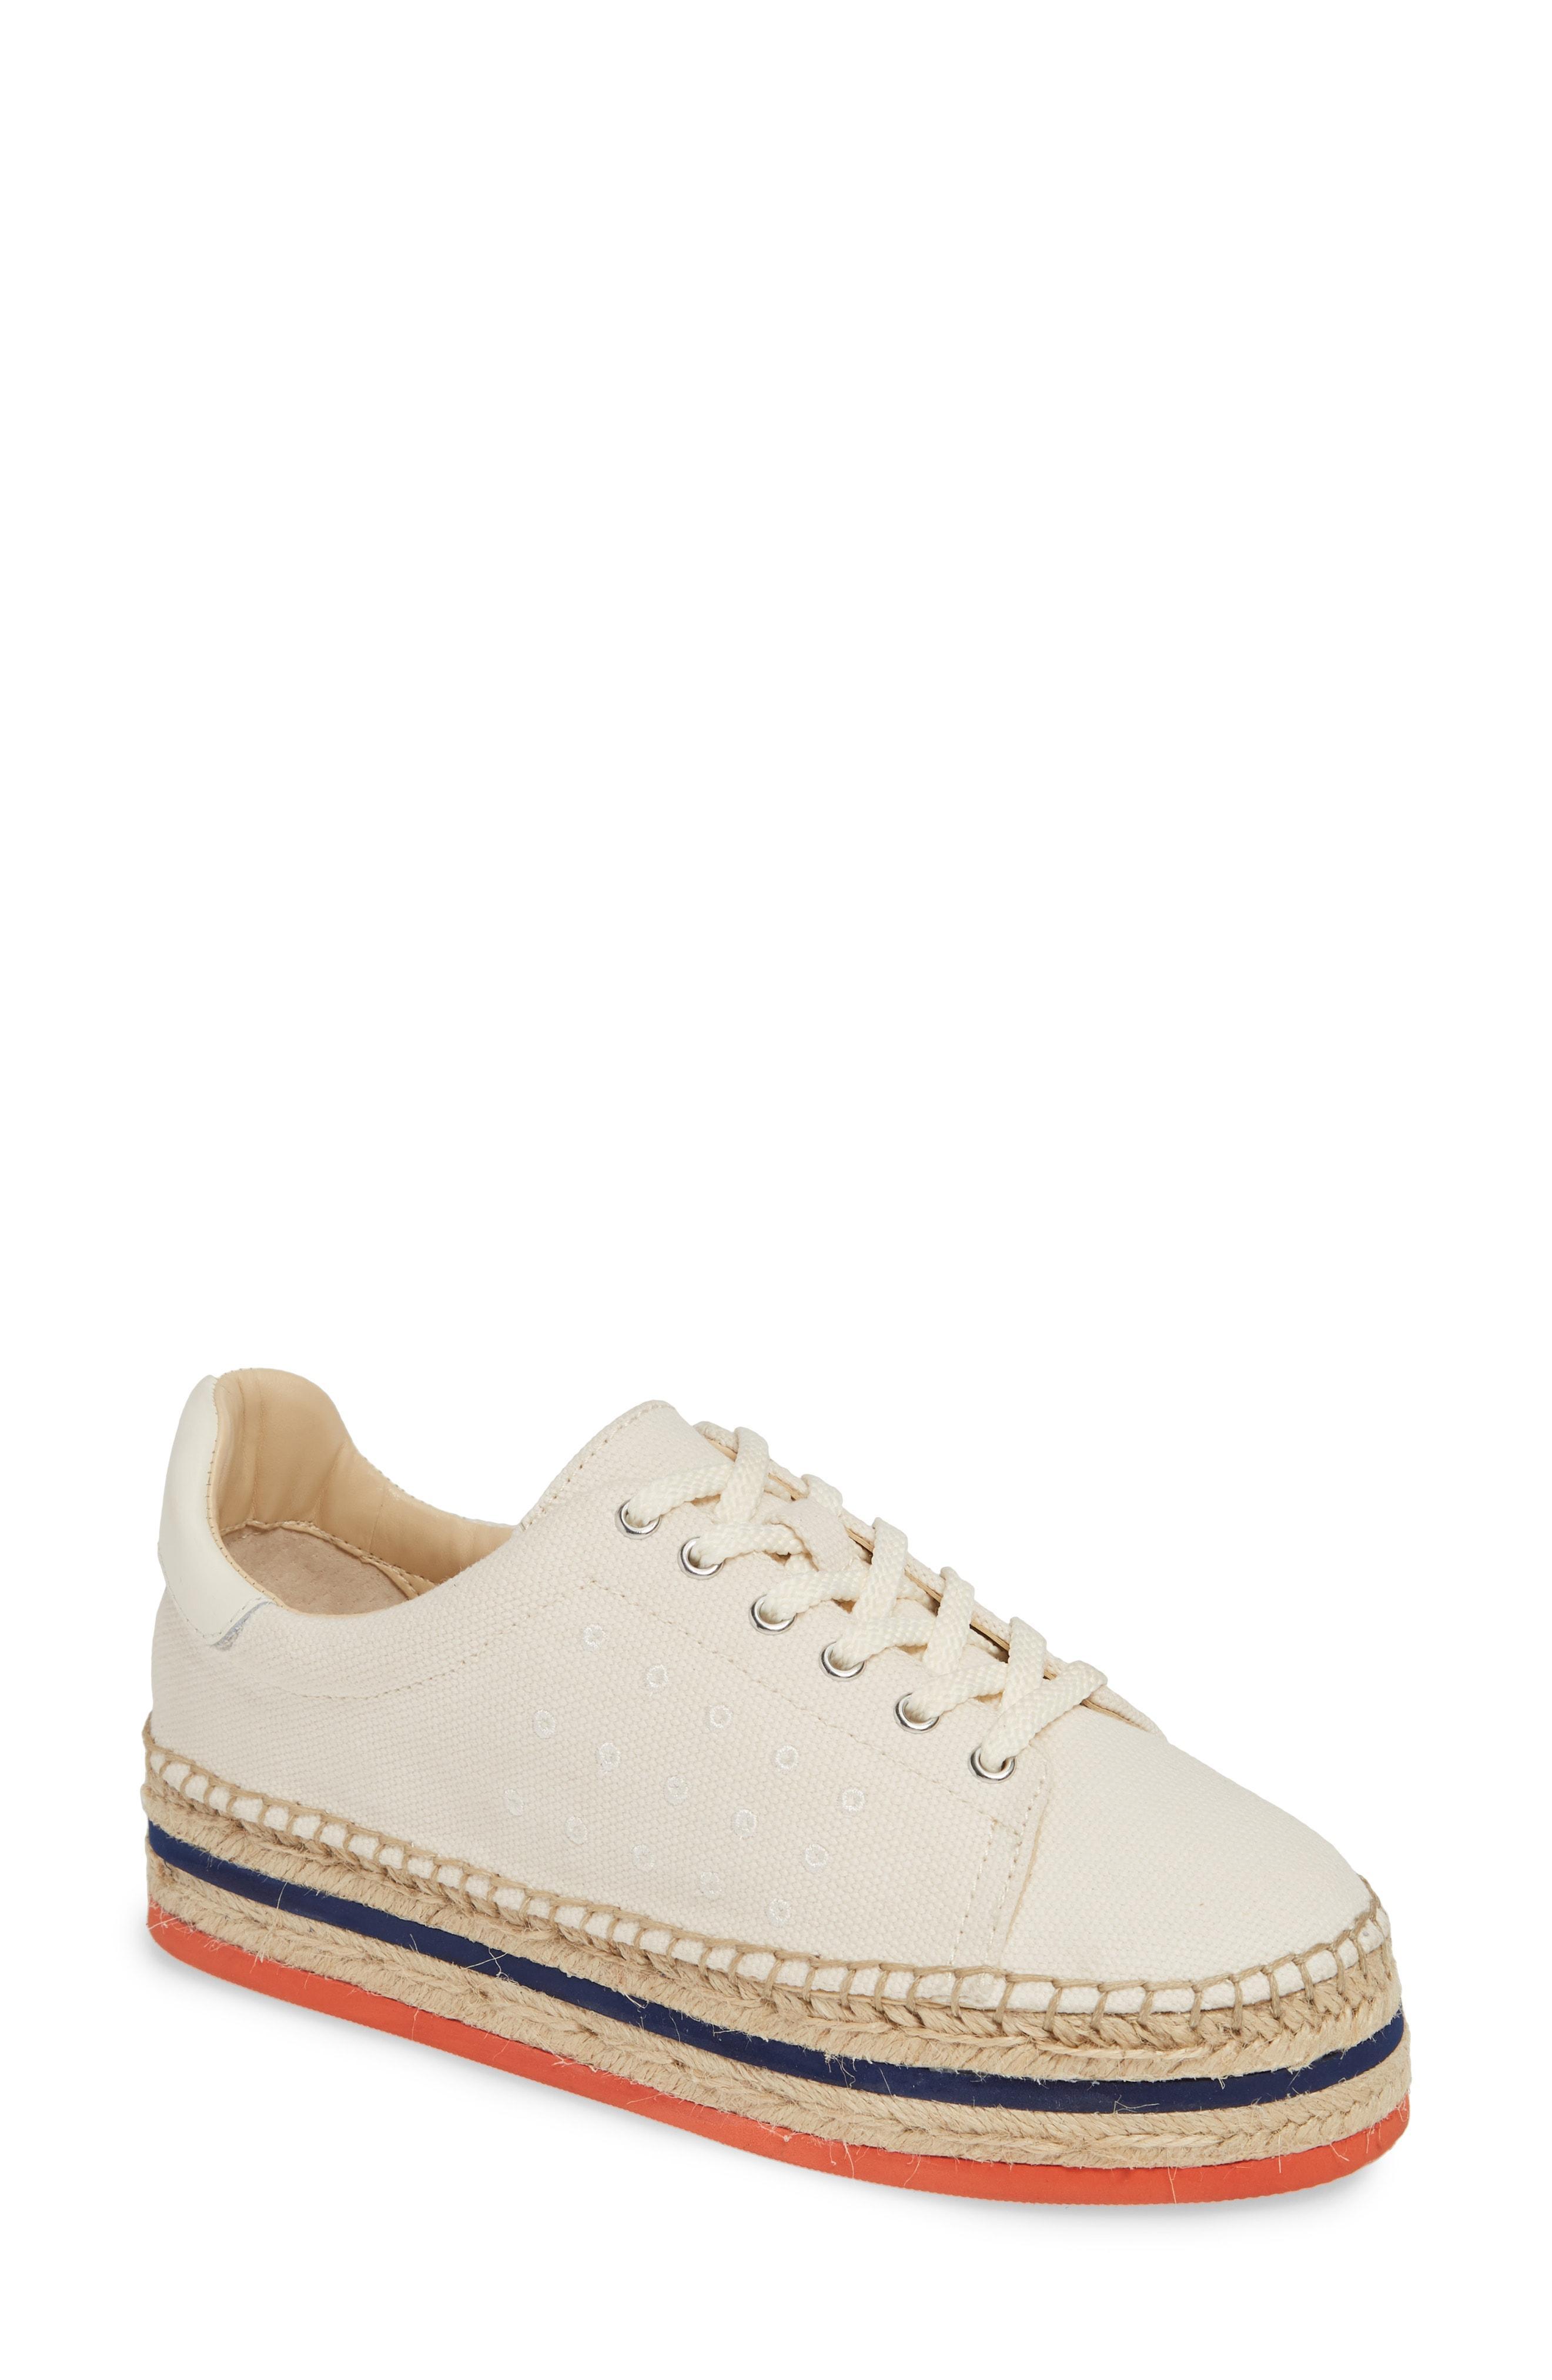 ee705f9c848 Lyst - Vince Camuto Jannel Platform Sneaker in White